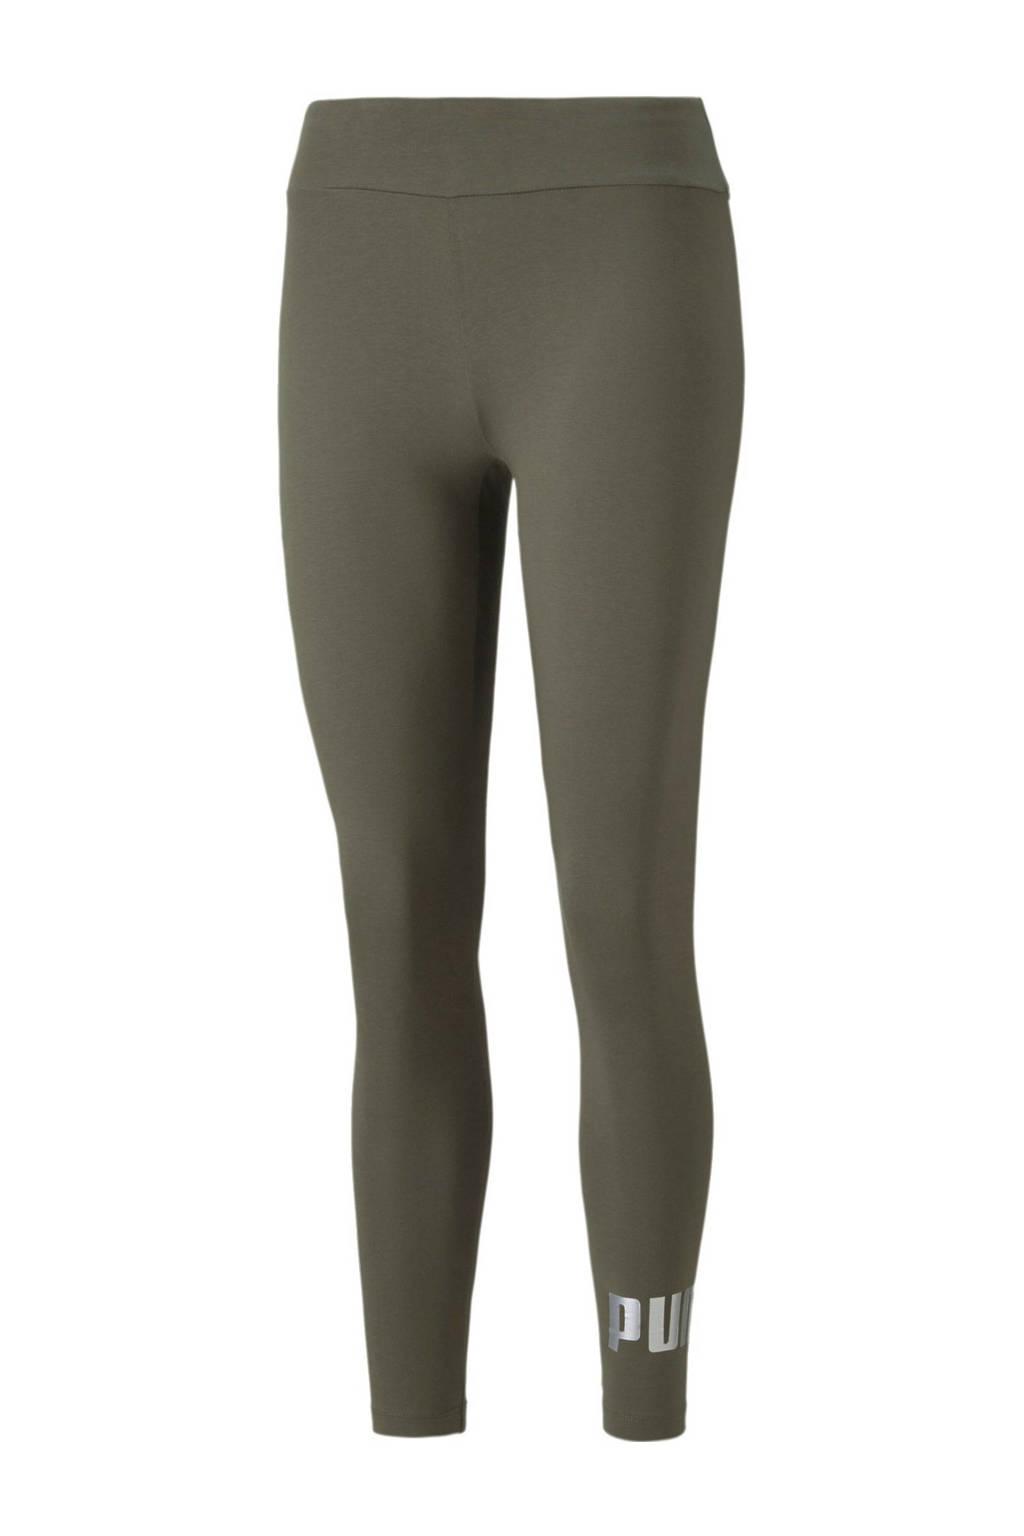 Puma high waist legging met logo groen/zilver, Groen/zilver